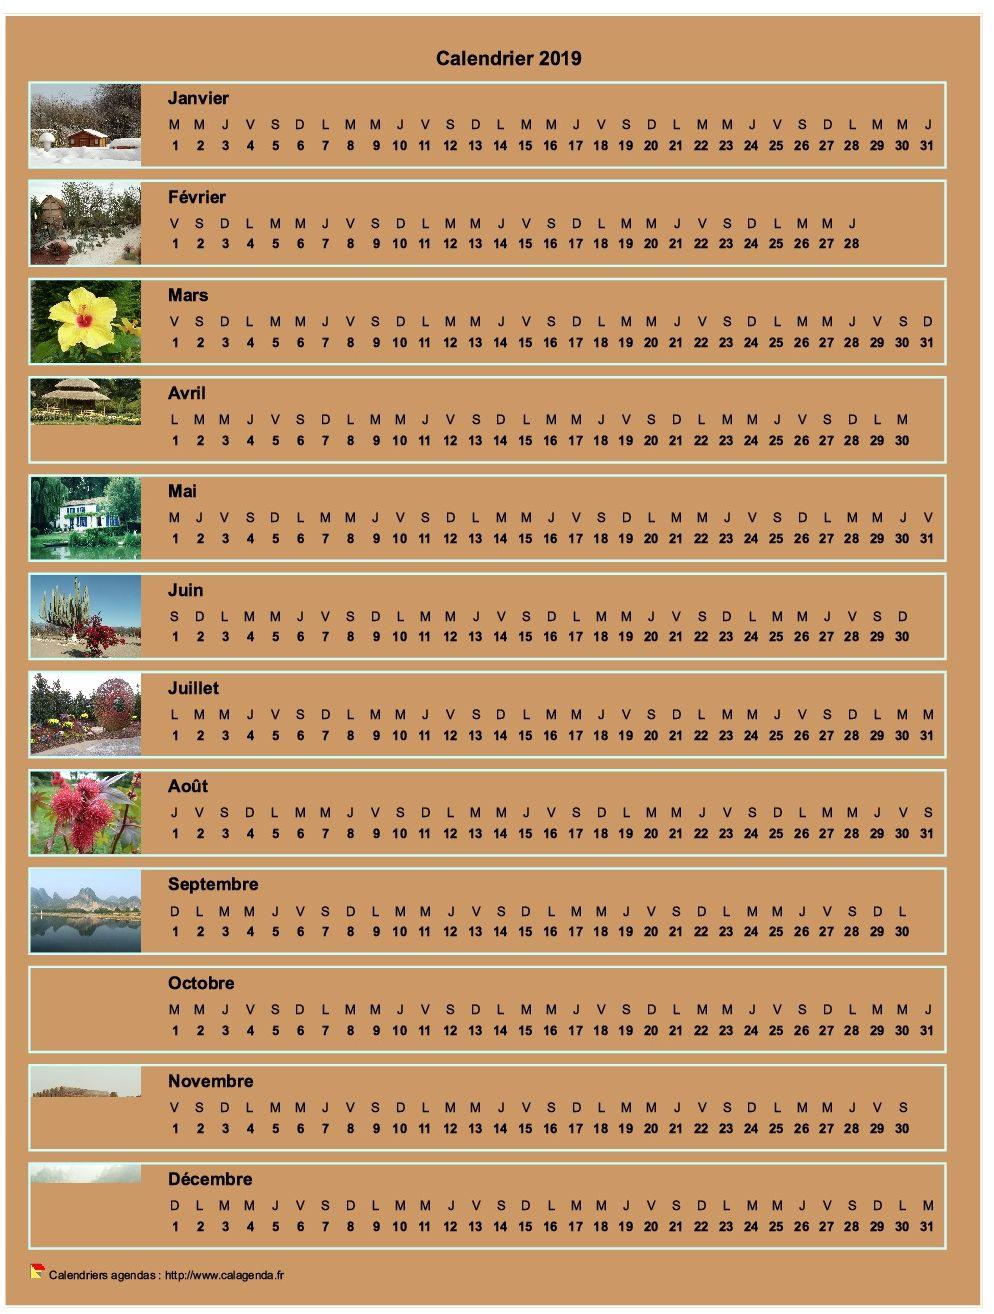 Calendrier 2019 annuel horizontal avec 12 photos